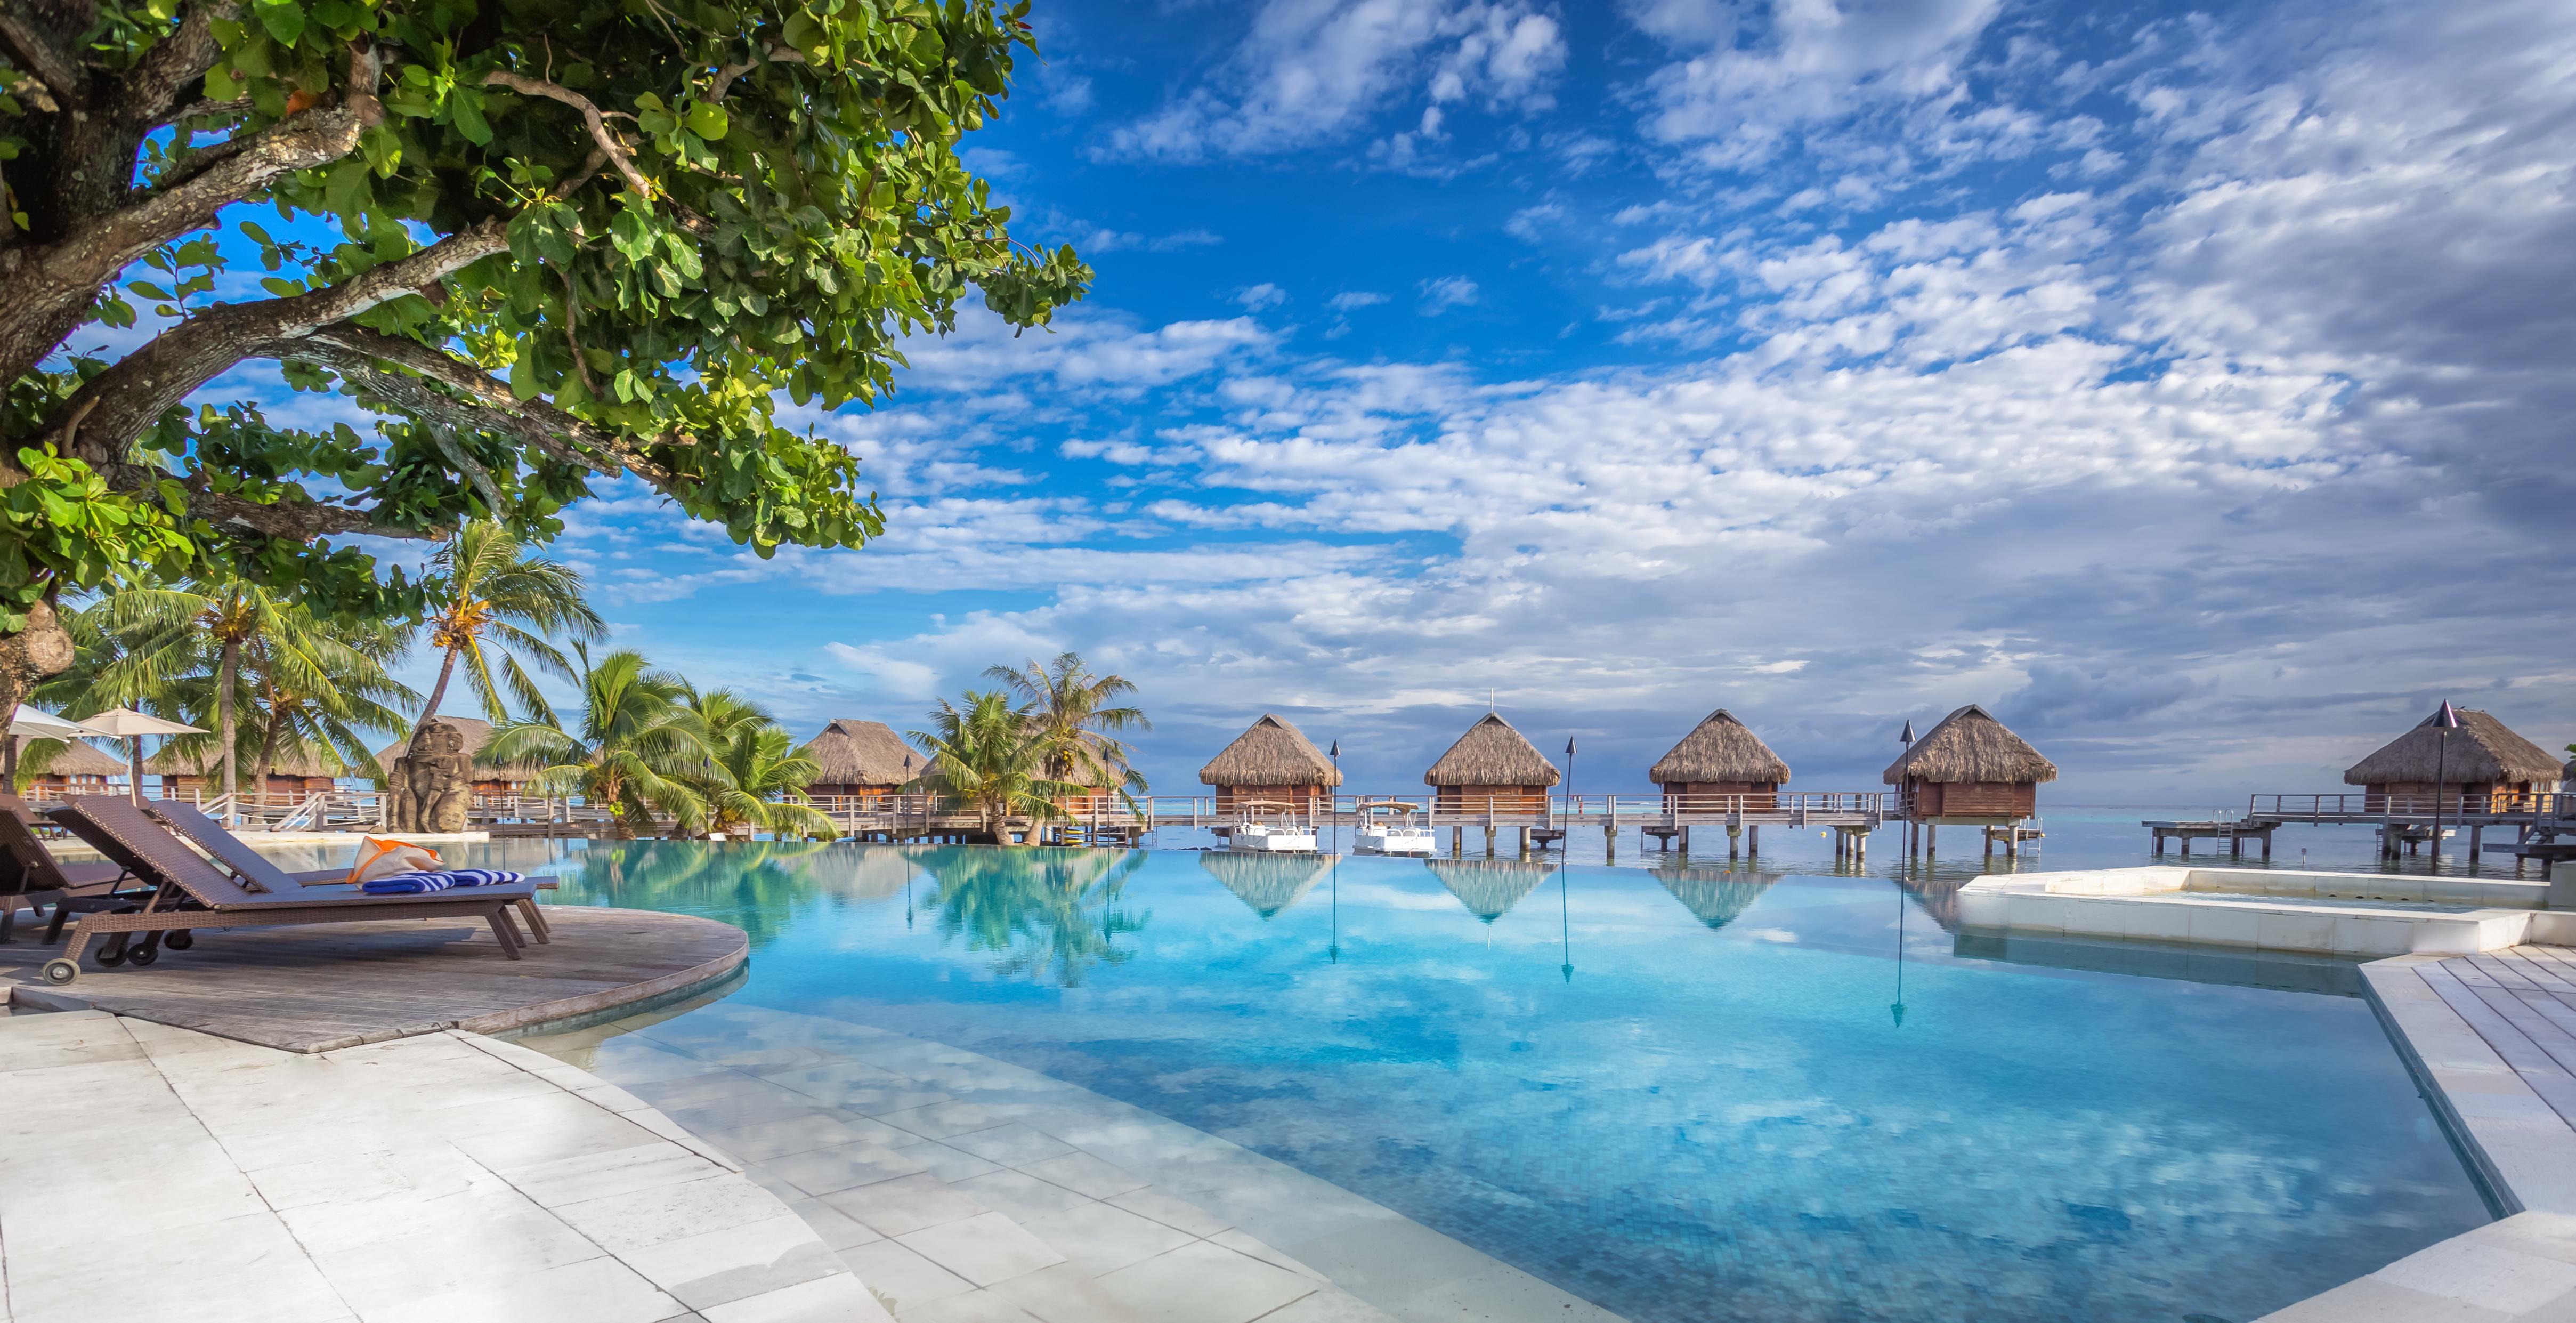 https://tahititourisme.fr/wp-content/uploads/2017/08/HEBERGEMENT-Manava-Beach-Resort-and-Spa-Moorea-1-Charles_Veronese.jpg